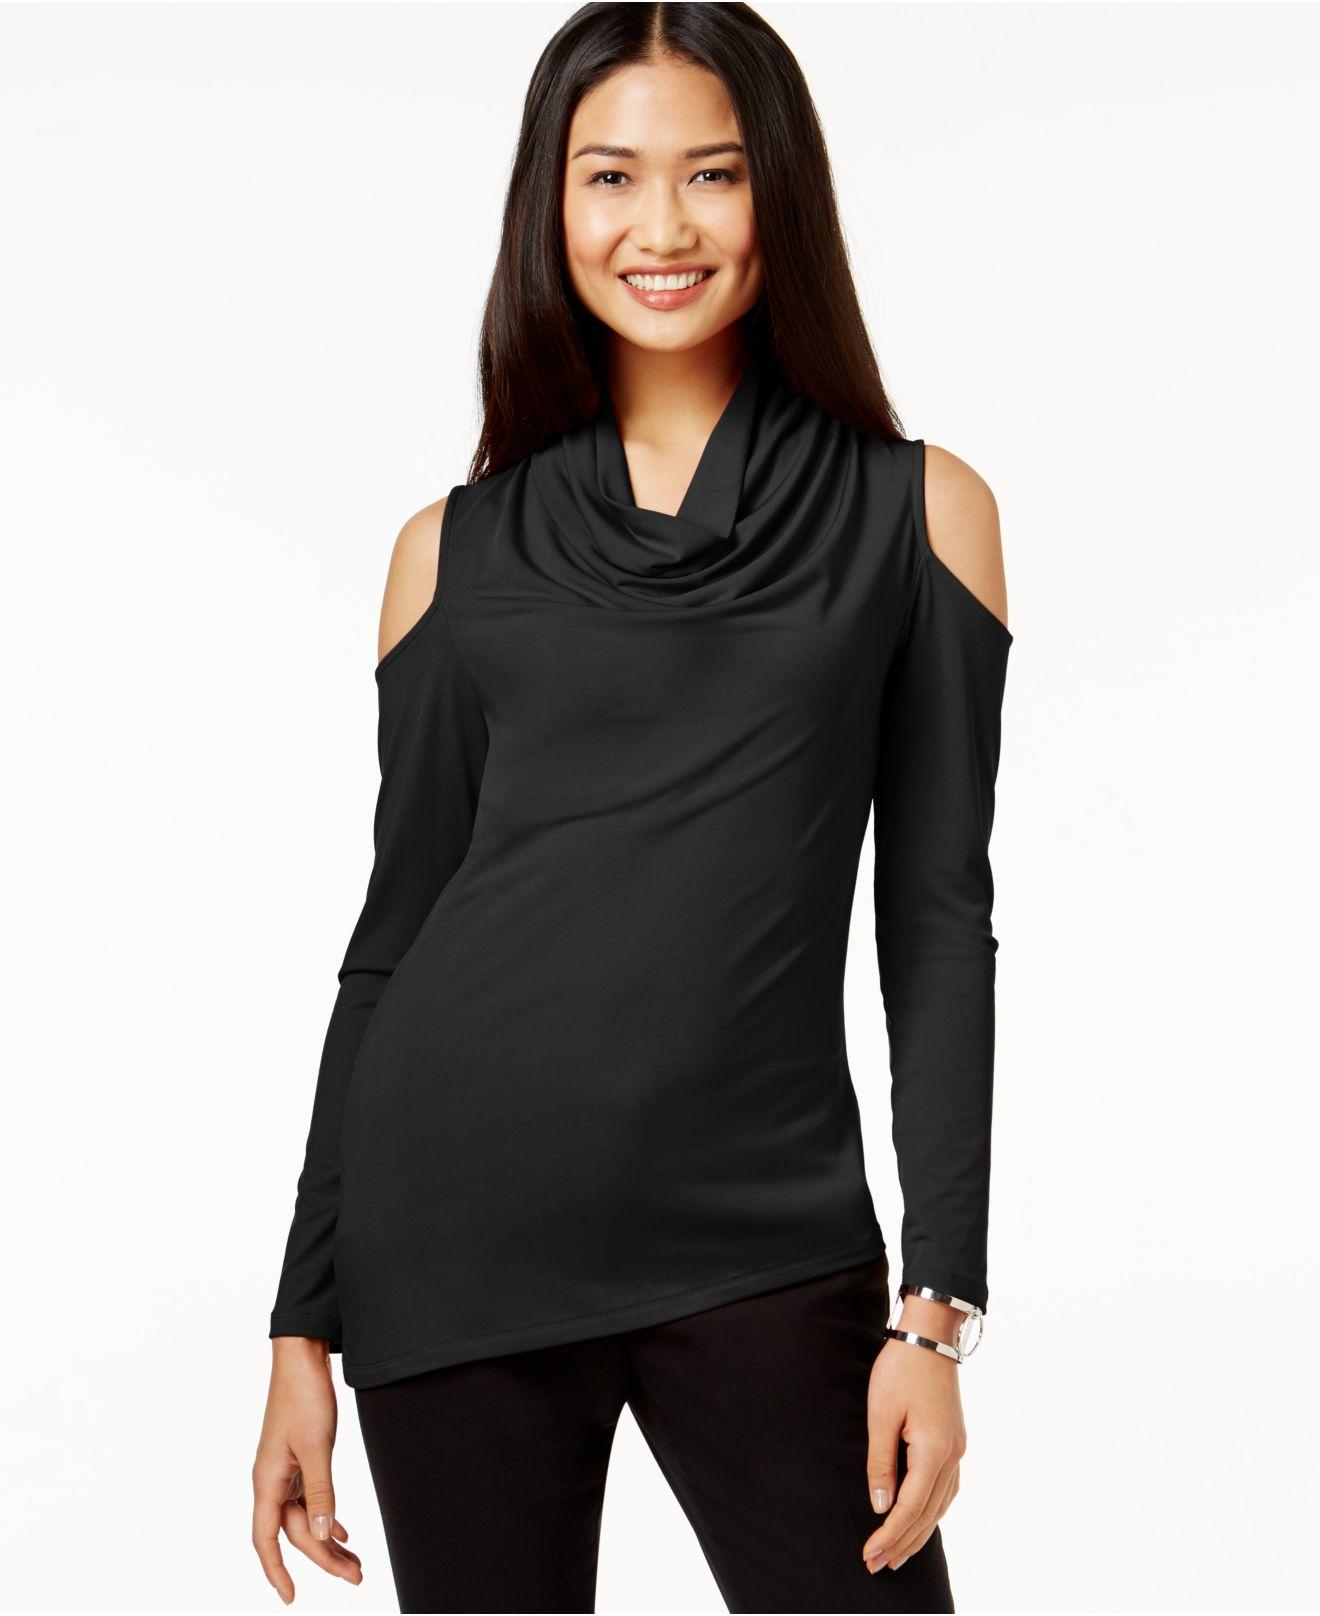 Dkny Cowl-neck Cold-shoulder Top in Black | Lyst